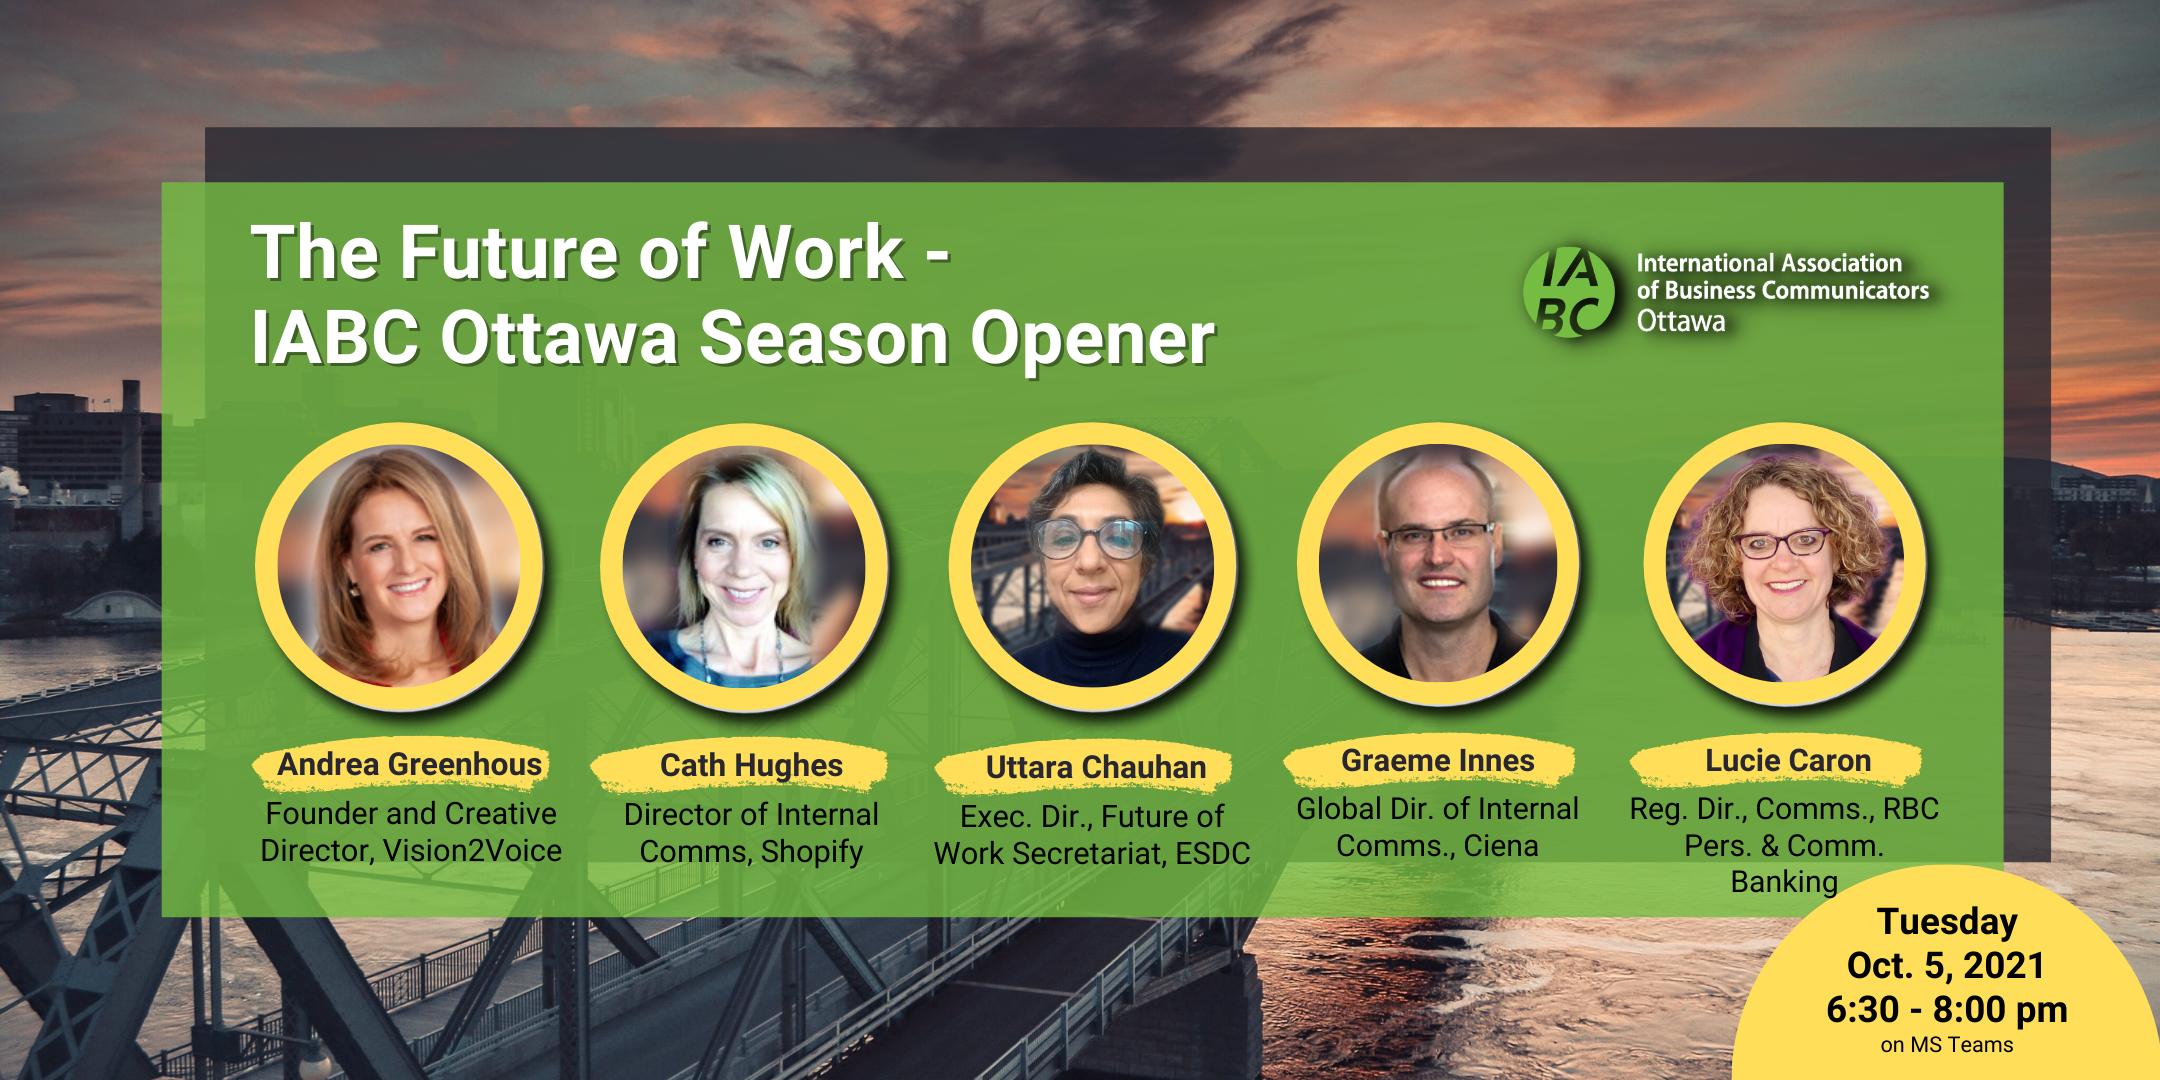 IABC Ottawa 2021 Season opener